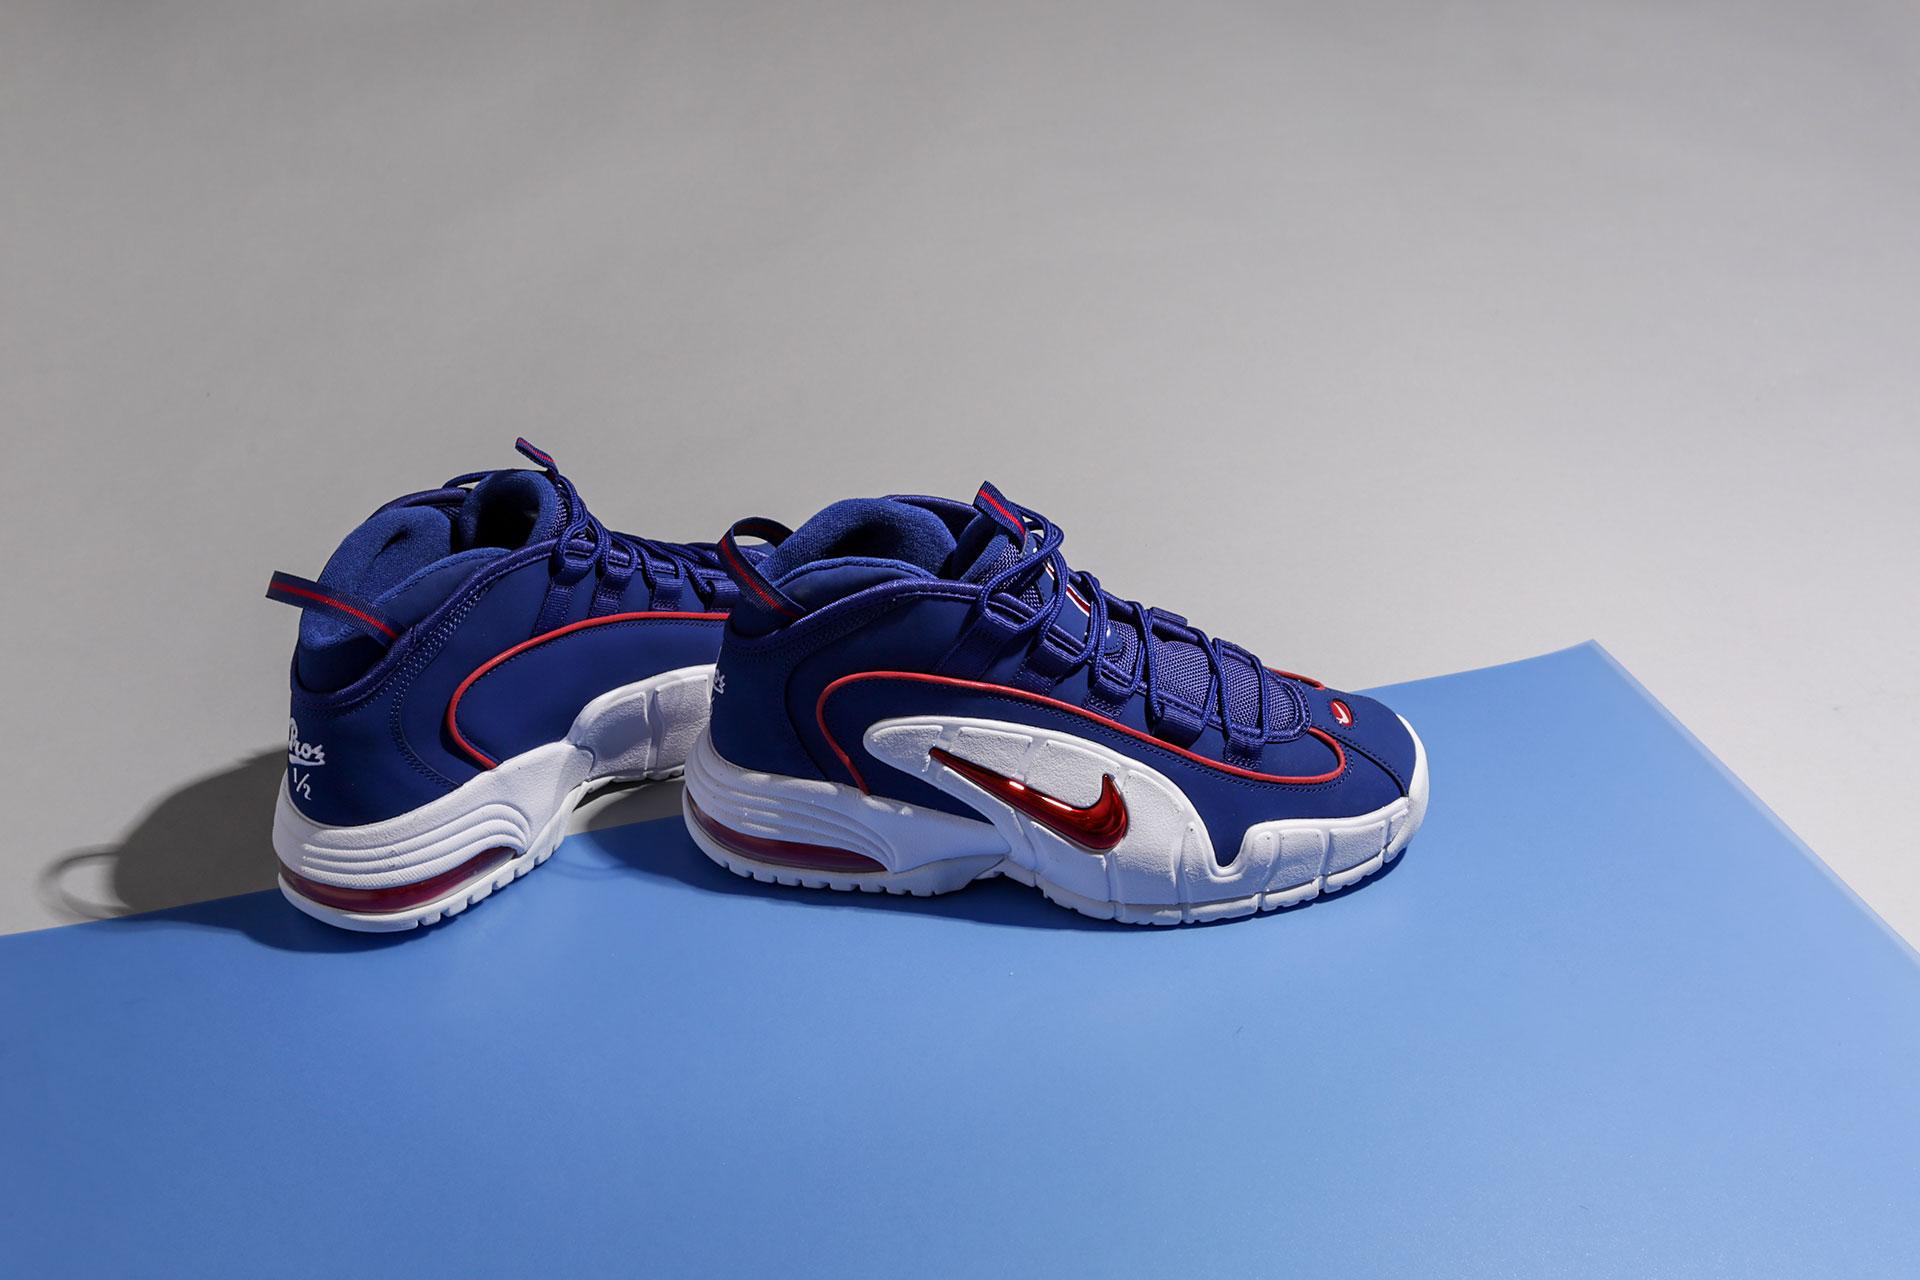 brand new b03b1 ec187 Купить мужские синие кроссовки Nike Air Max Penny